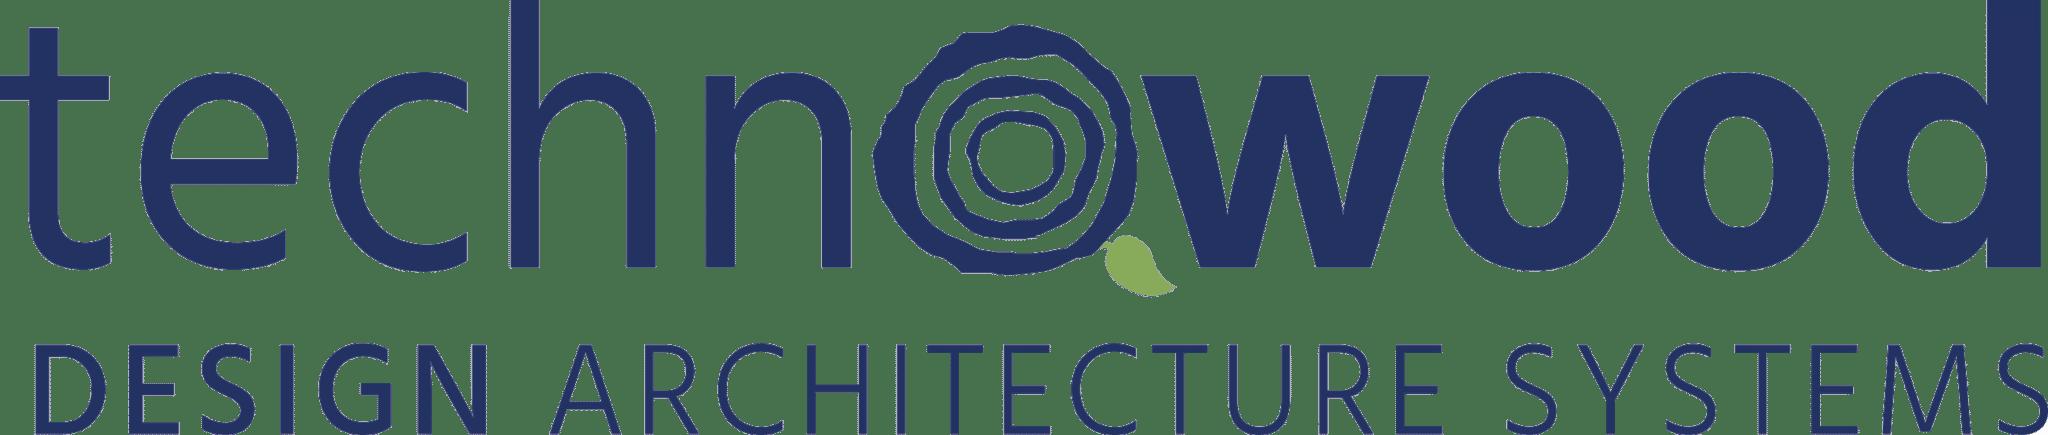 technowood Logo